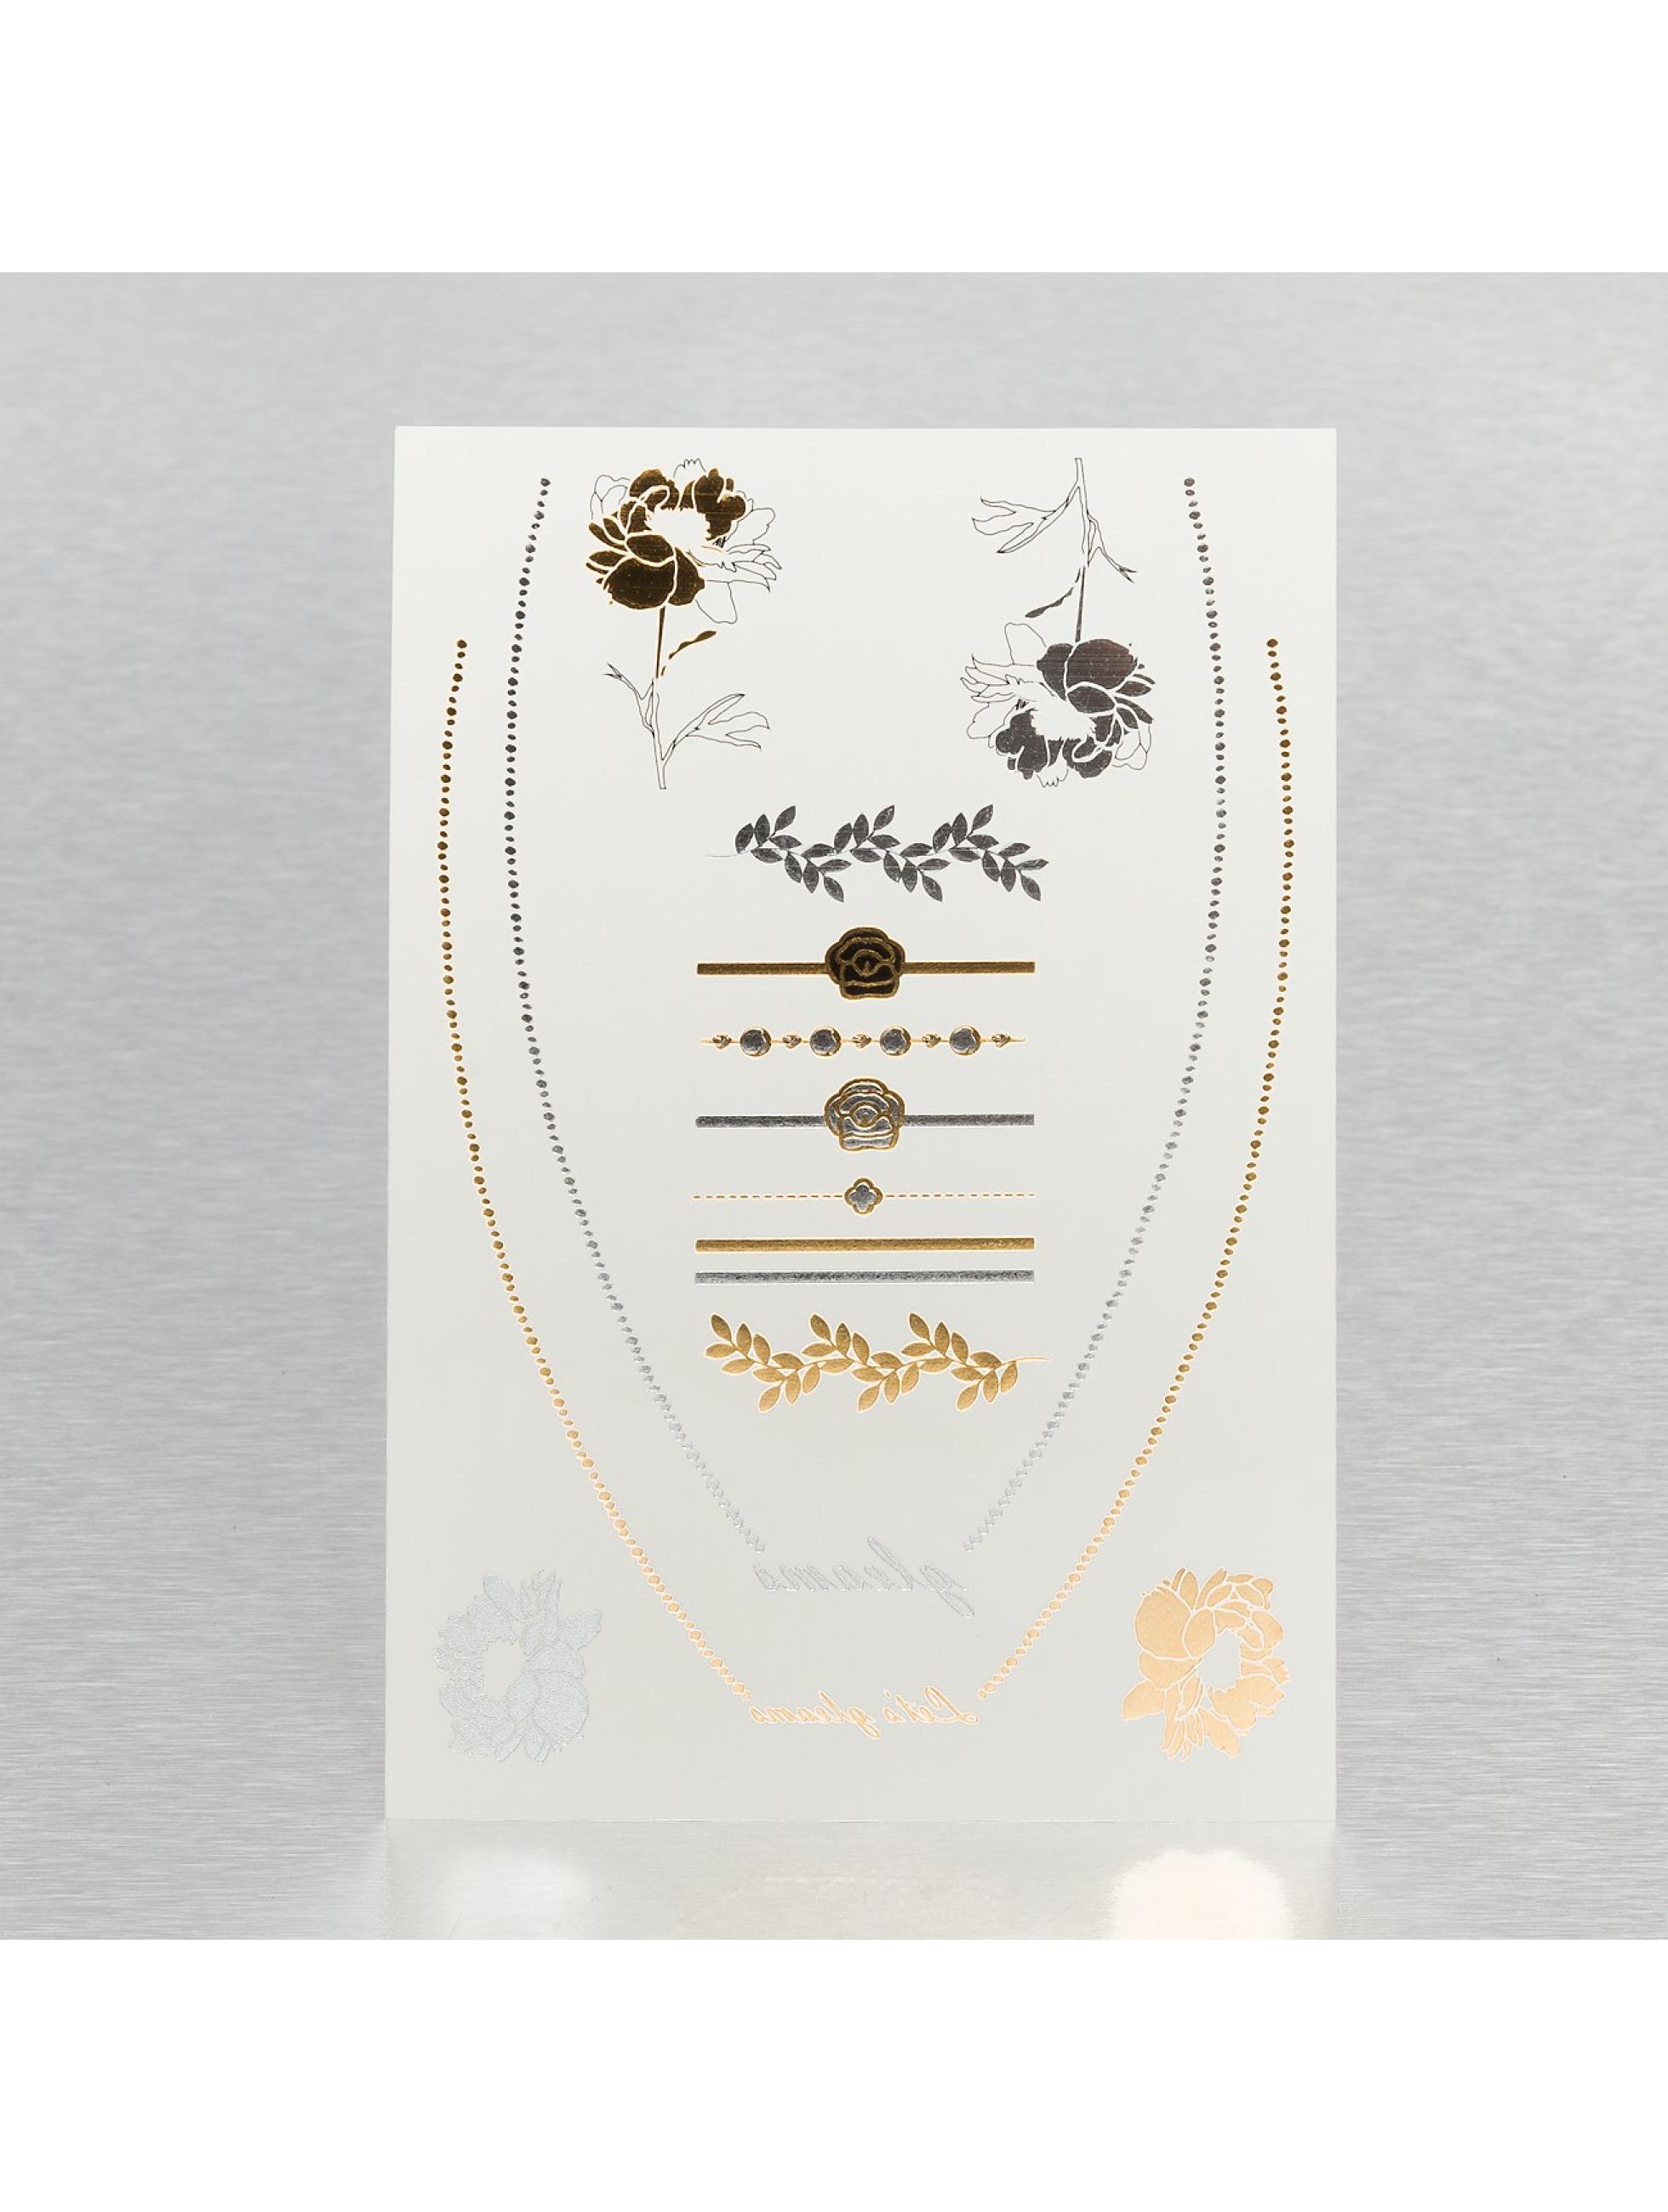 Gleams Frauen Sonstige Royal II Skin in goldfarben